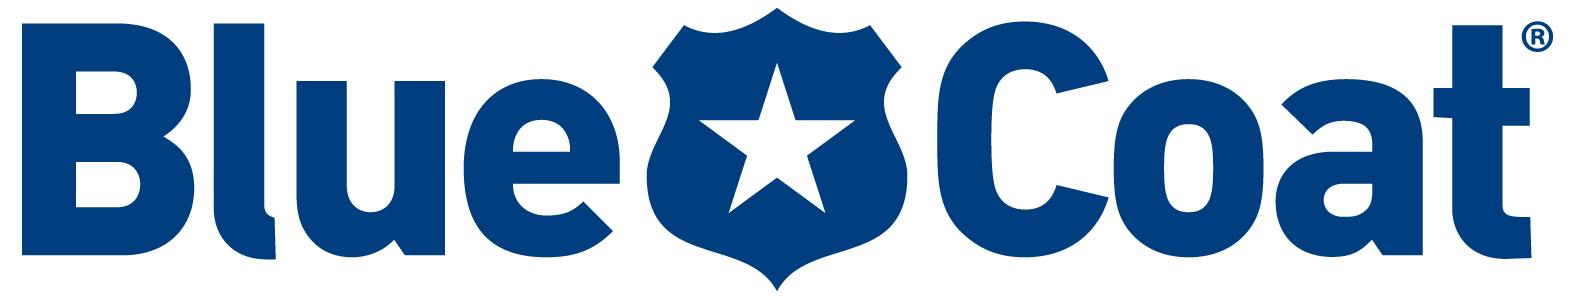 bluecoat logo.jpg